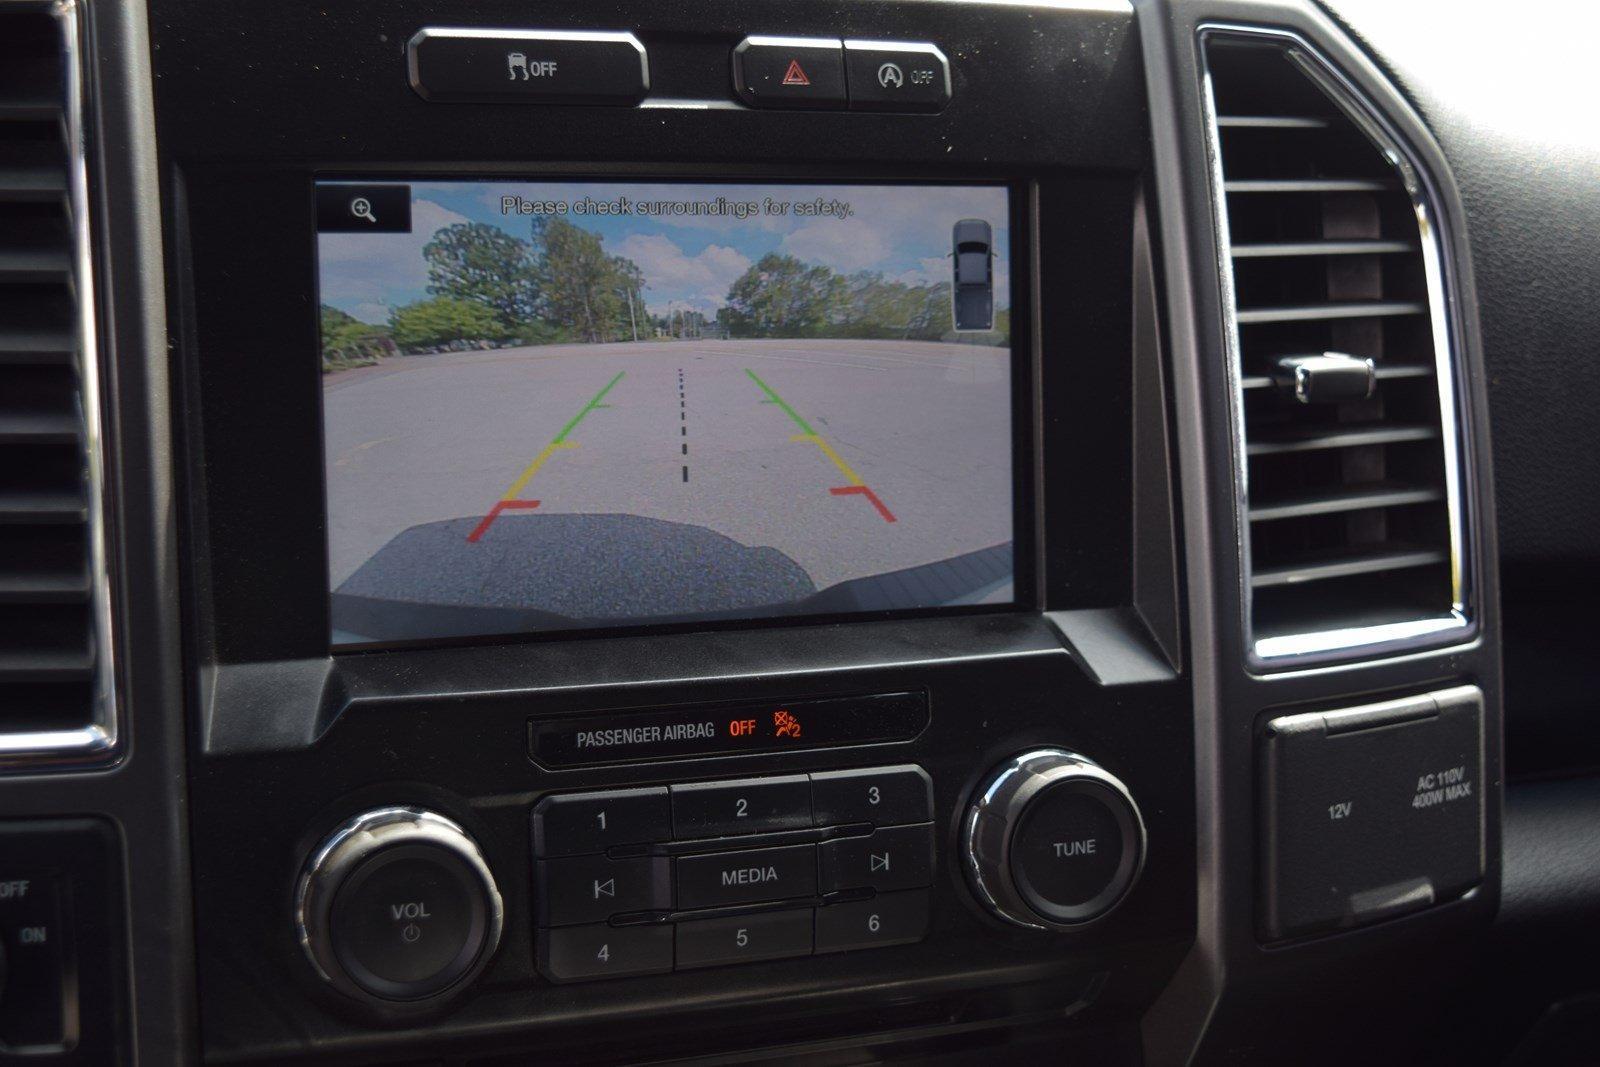 2015 Ford F 150 Xlt Stock C36268 For Sale Near Sandy Springs Ga Navigation Radio Used